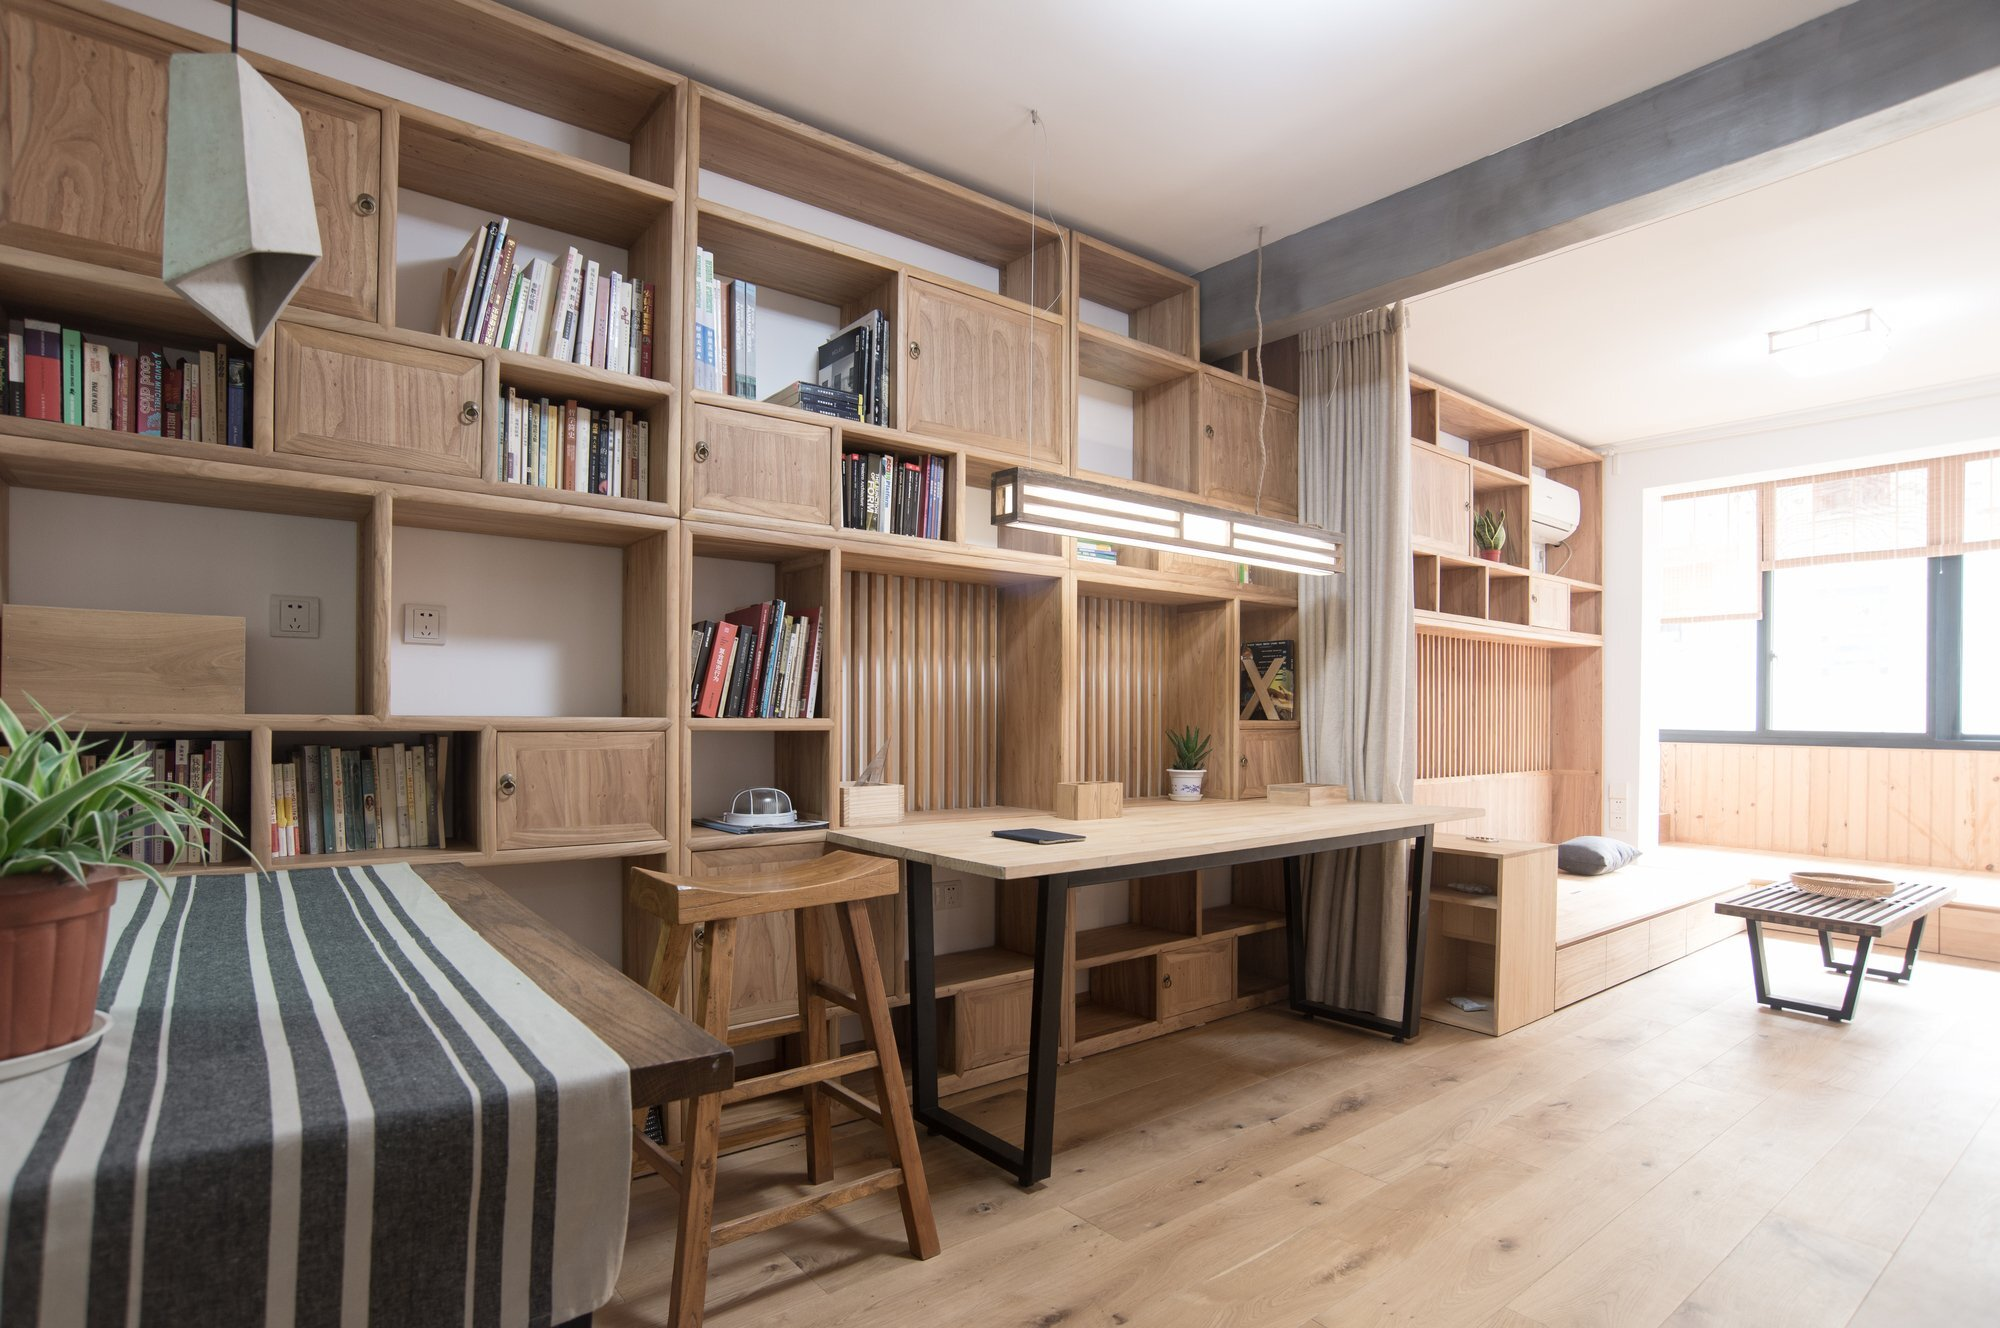 Traditional Chinese Home Design - Guo Donghai & Yan Linglin - Shanghai China - Living Area - Humble Homes